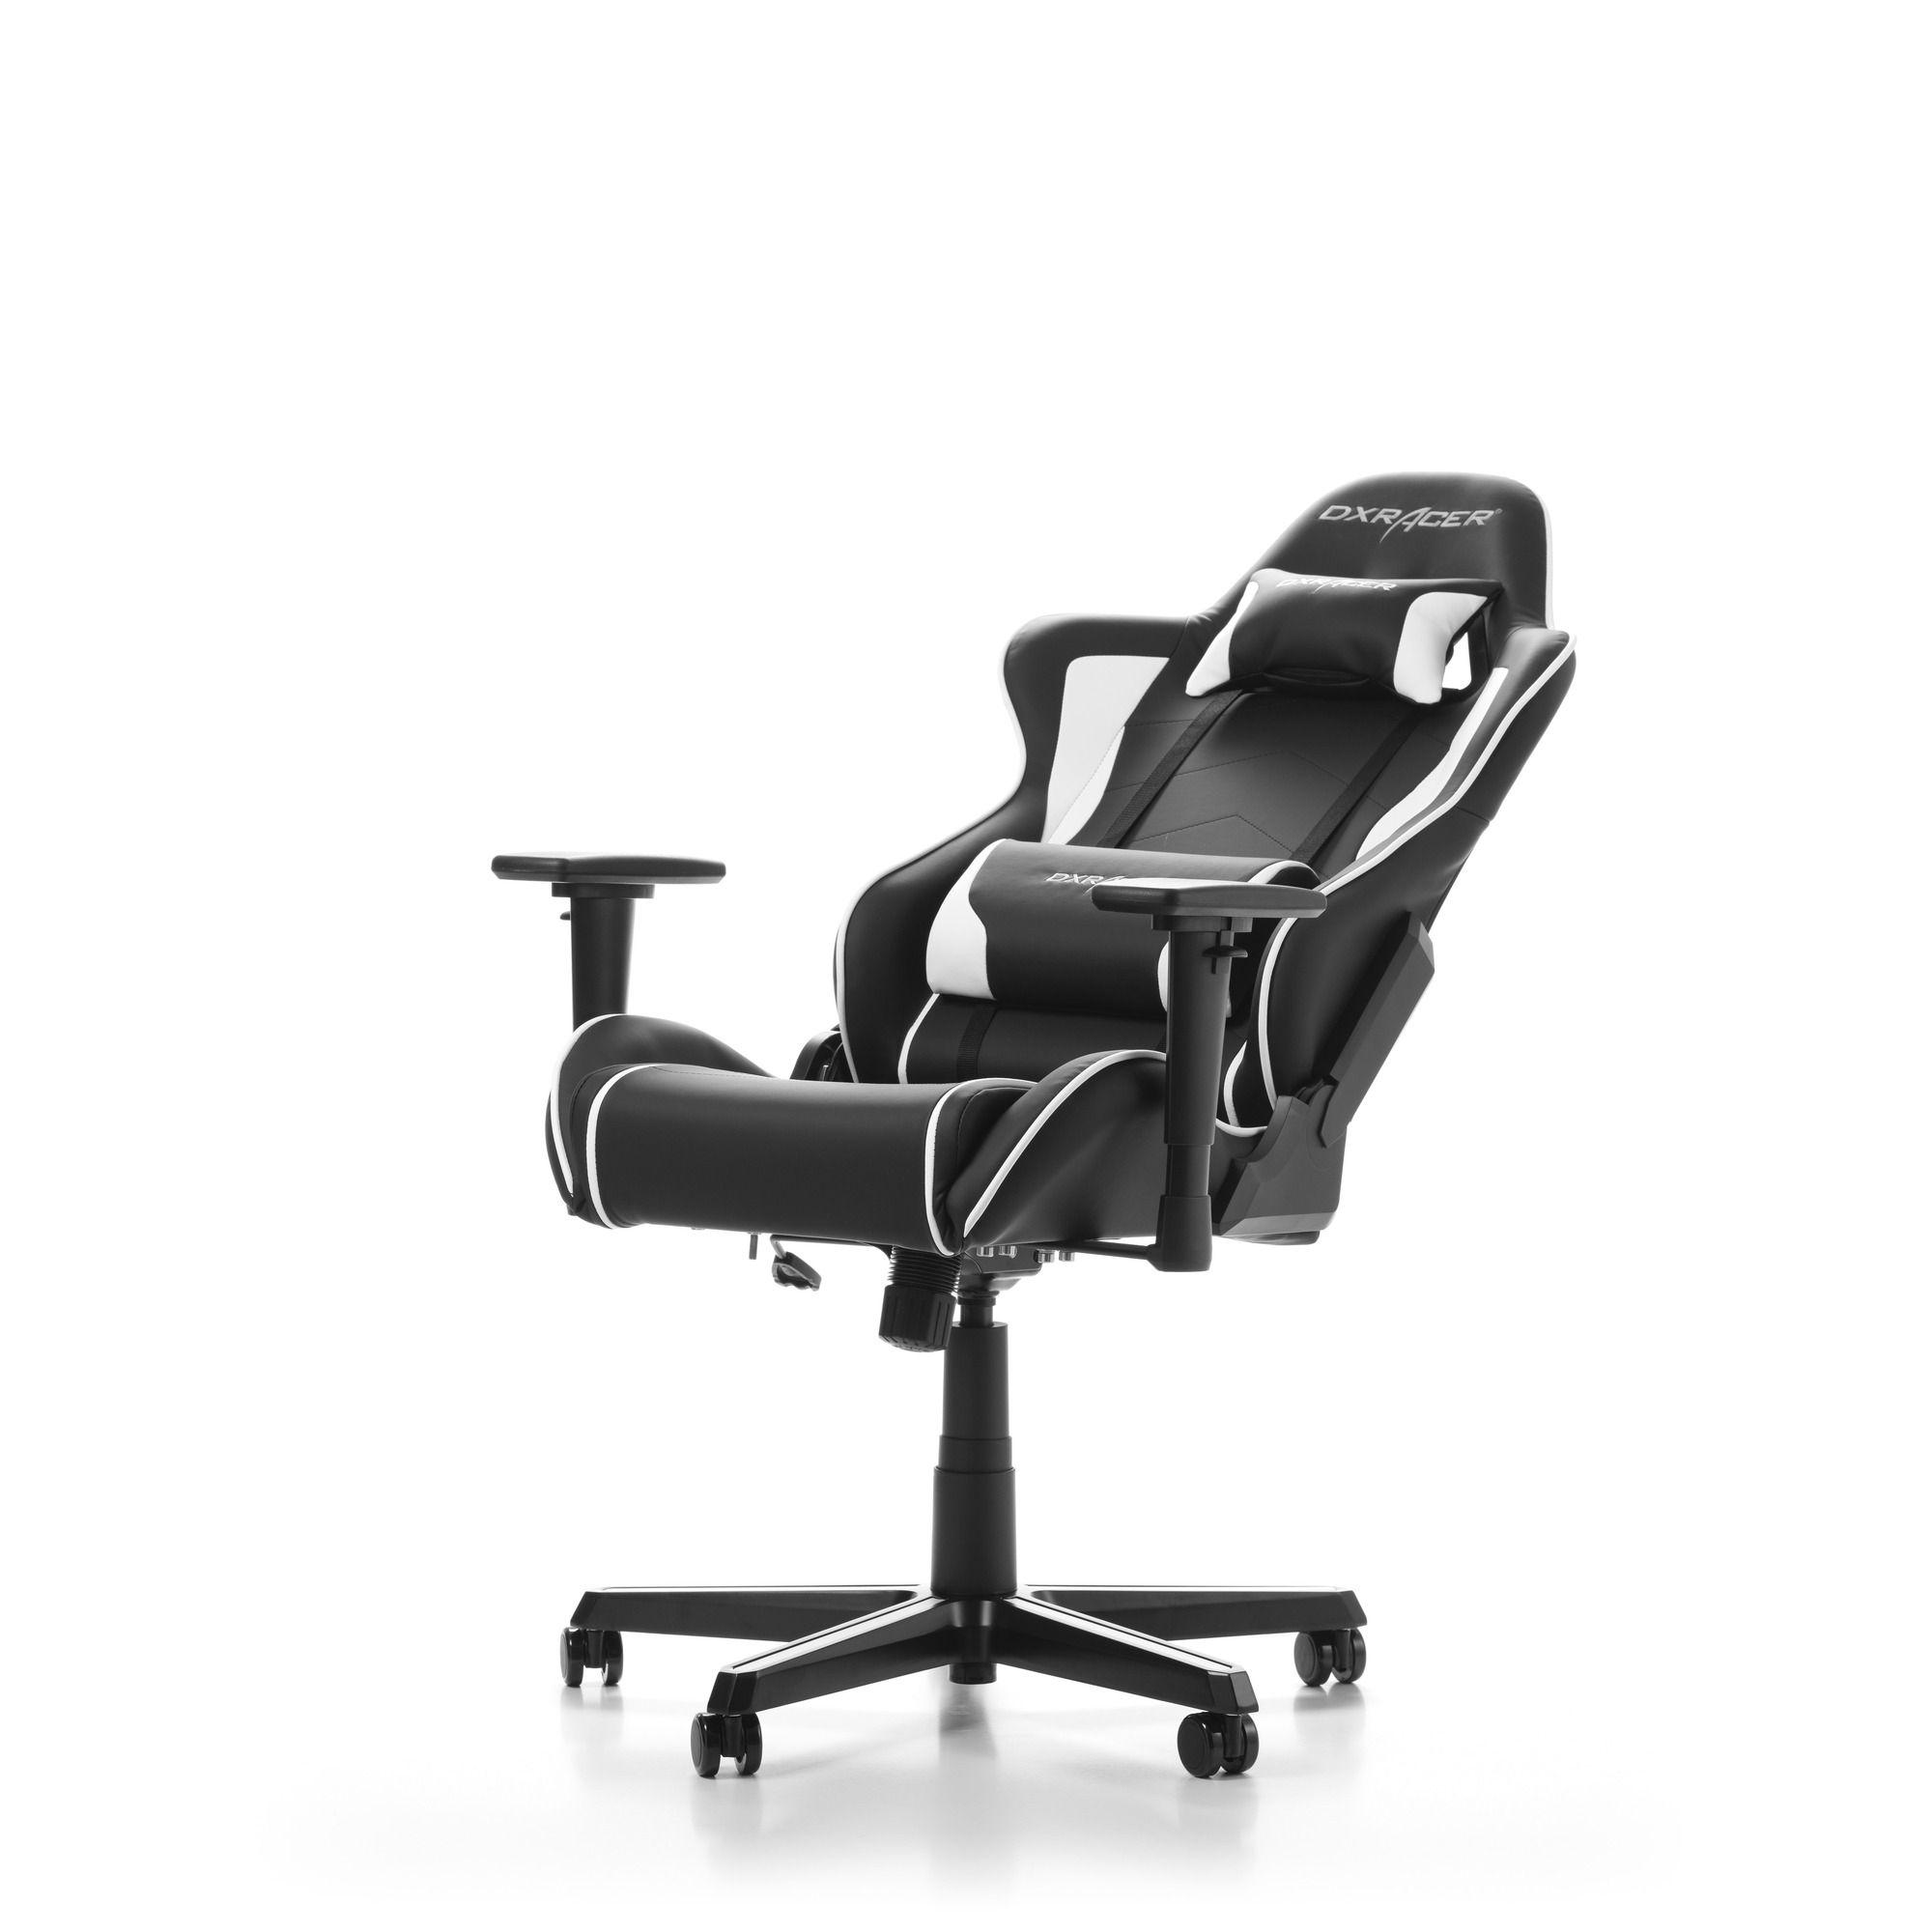 Гейминг стол DXRacer OH/FH08/NW - серия FORMULA, черен/бял - 3